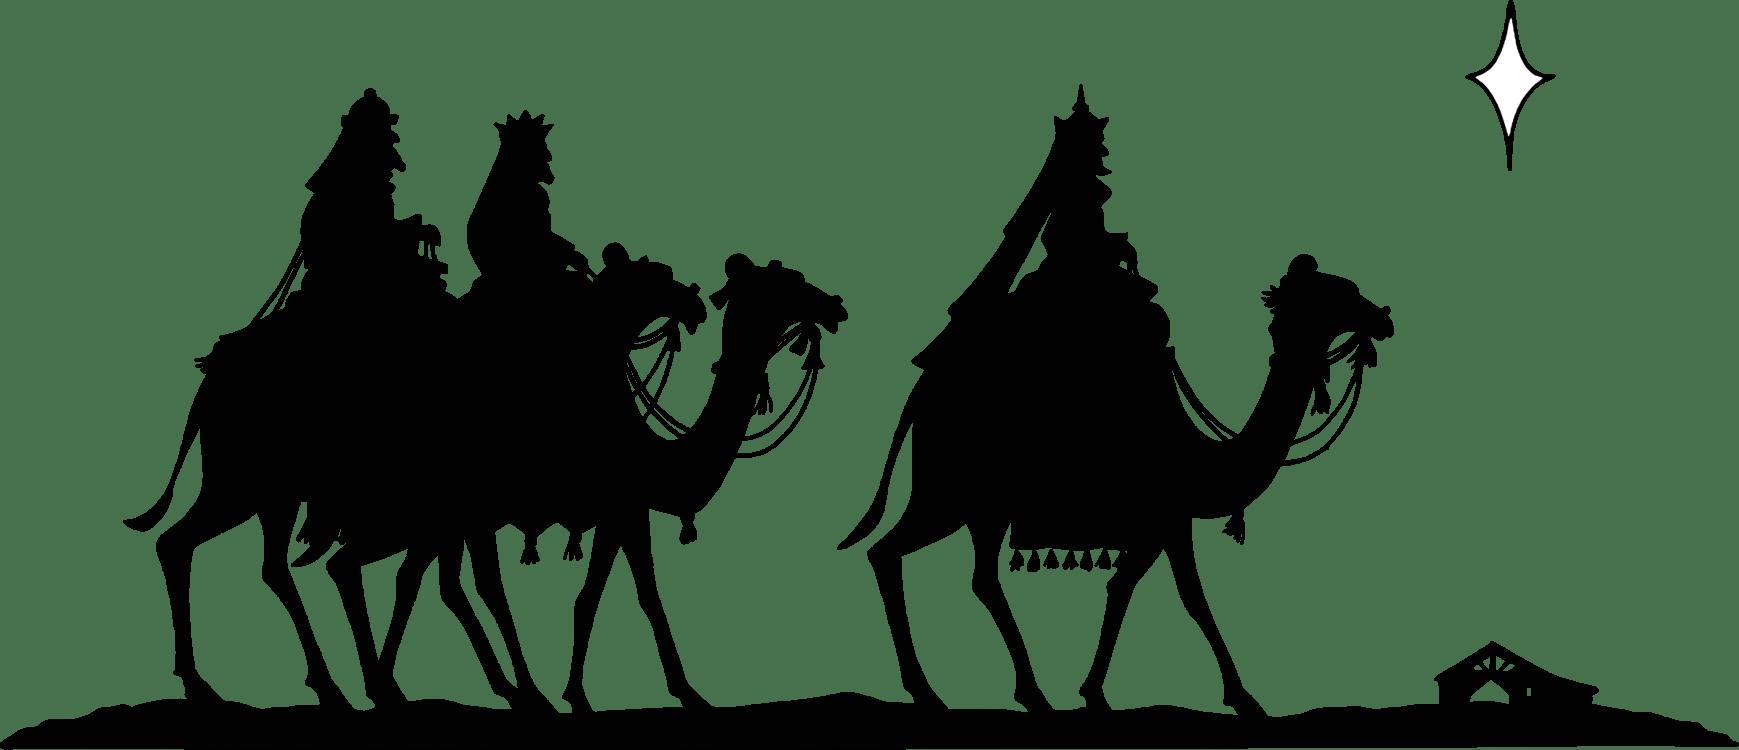 hight resolution of biblical magi christian clip art nativity scene nativity of jesus